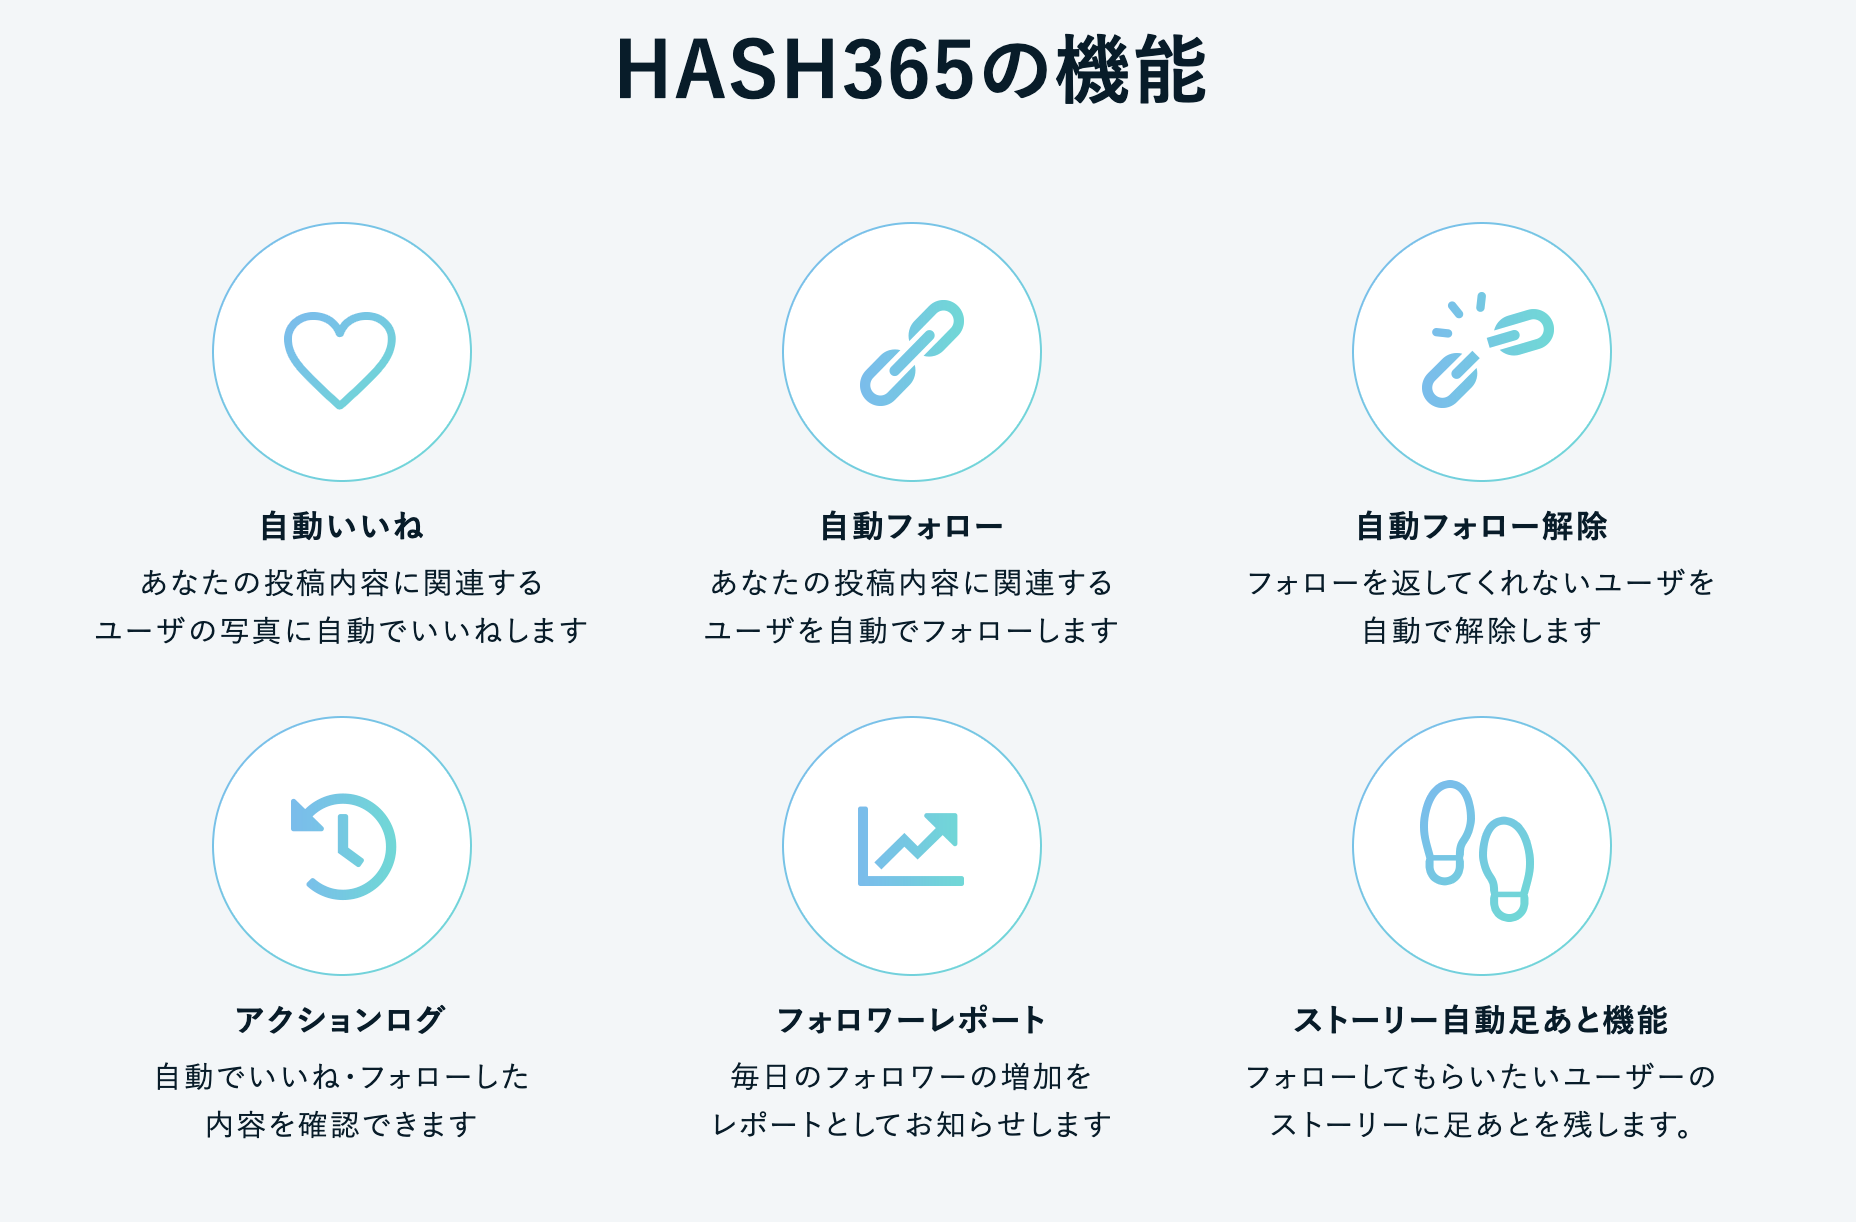 HASH365の機能面